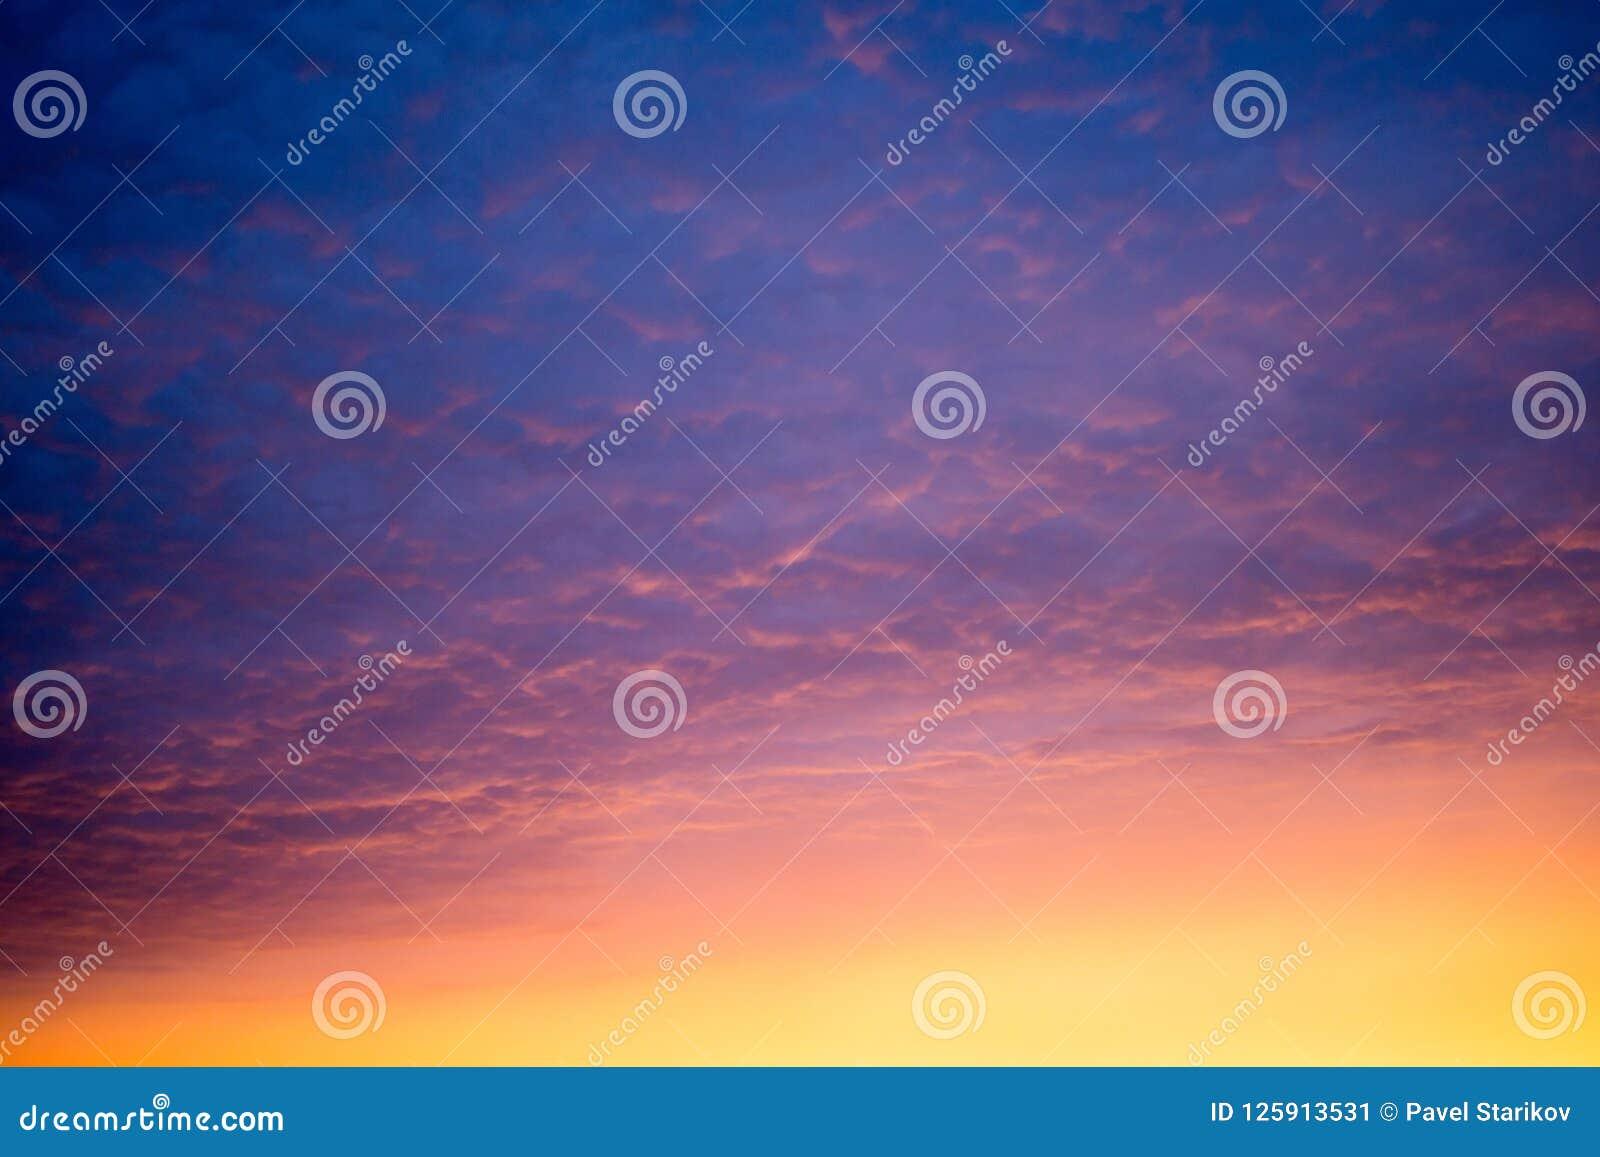 Bunt vom Sonnenunterganghimmel